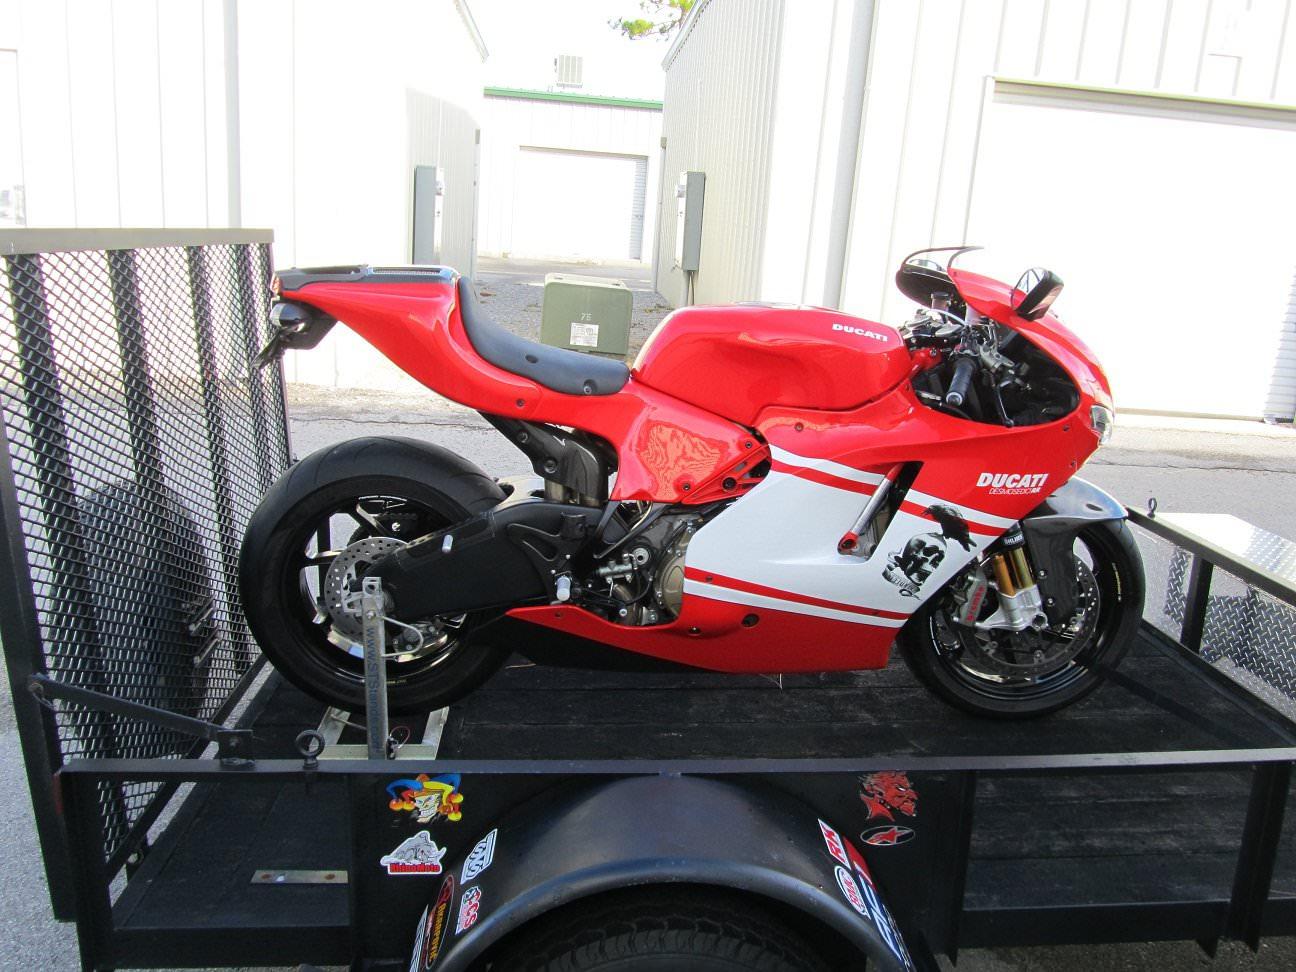 moto d strapless transport system ducati motorcycle. Black Bedroom Furniture Sets. Home Design Ideas